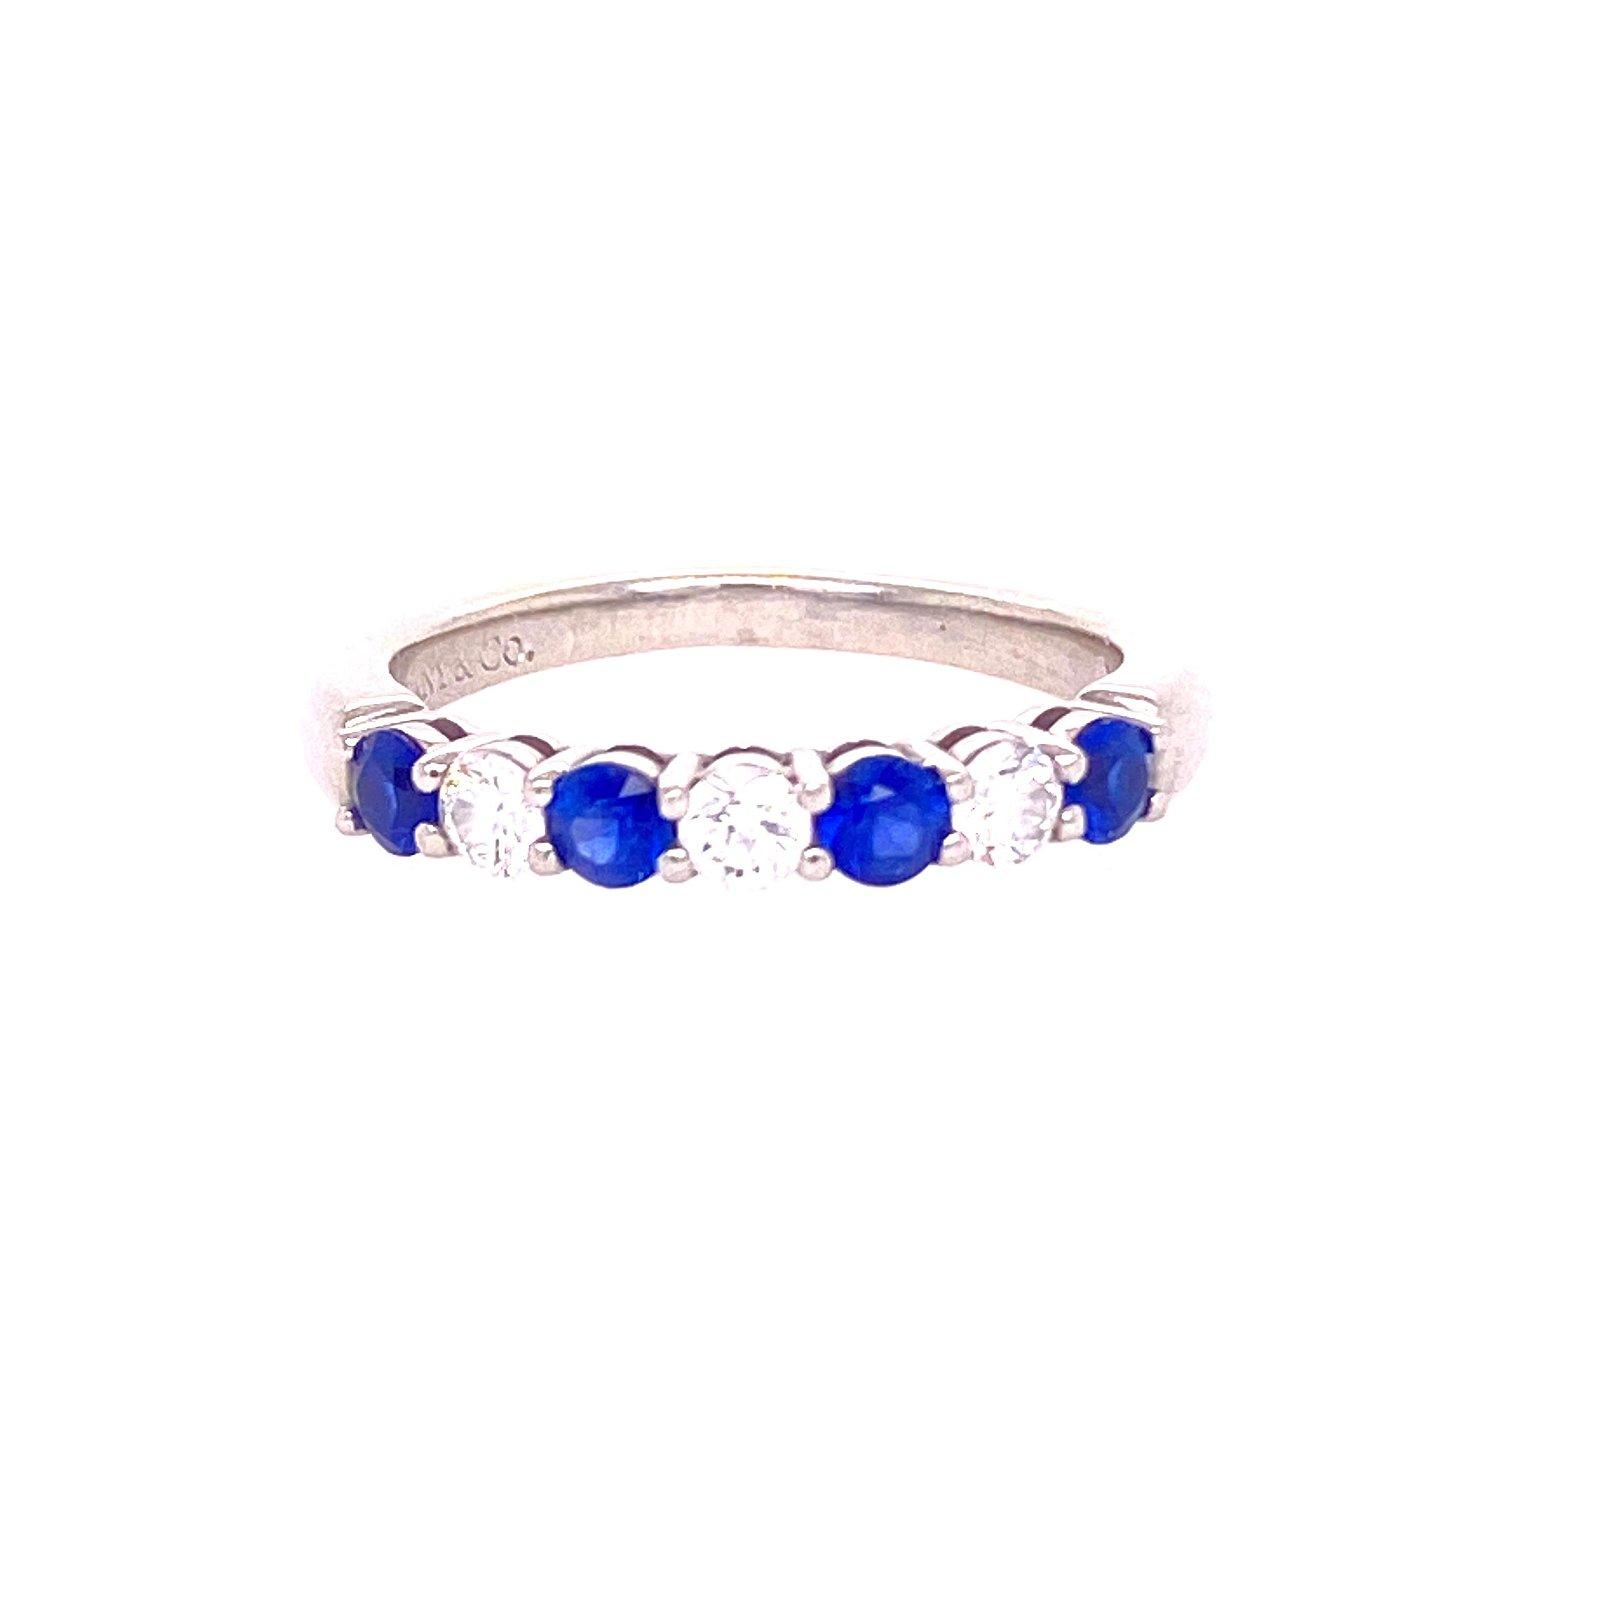 TIFFANY & CO. Platinum Diamond Sapphire Ring